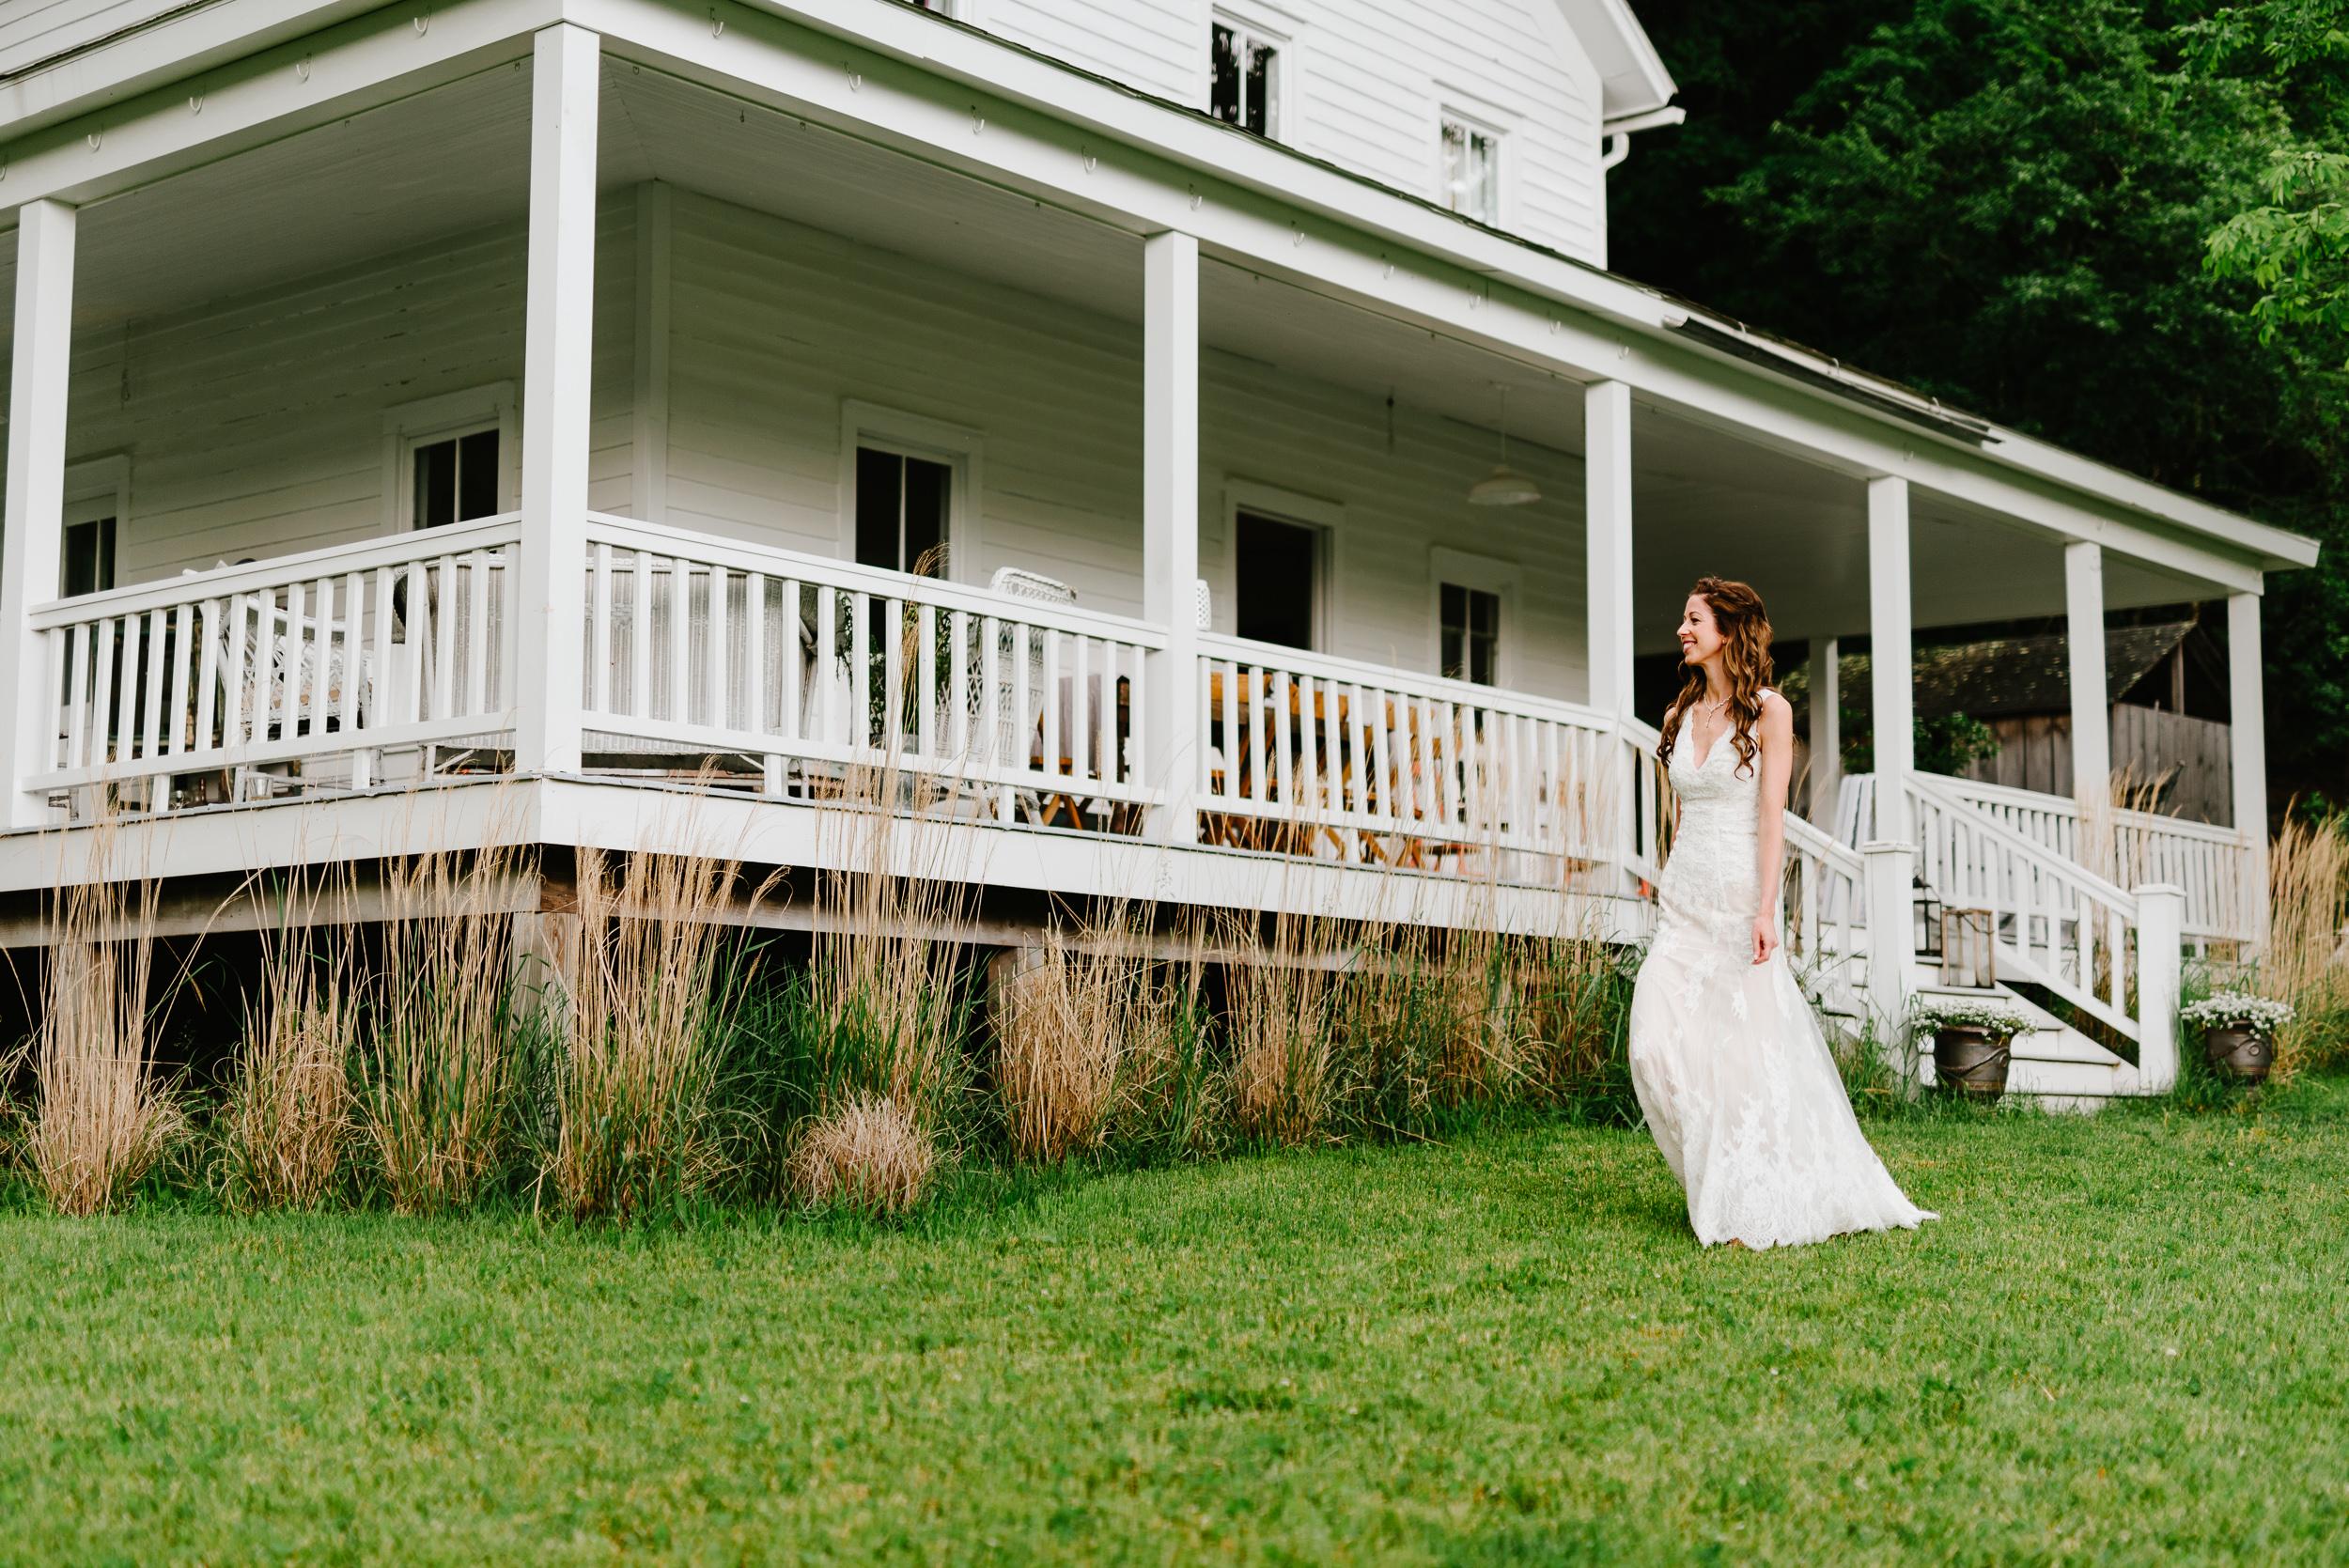 027-Handsome Hollow Wedding Photos Handsome Hollow Wedding Air BNB Wedding Brooklyn Wedding Photographer.jpg